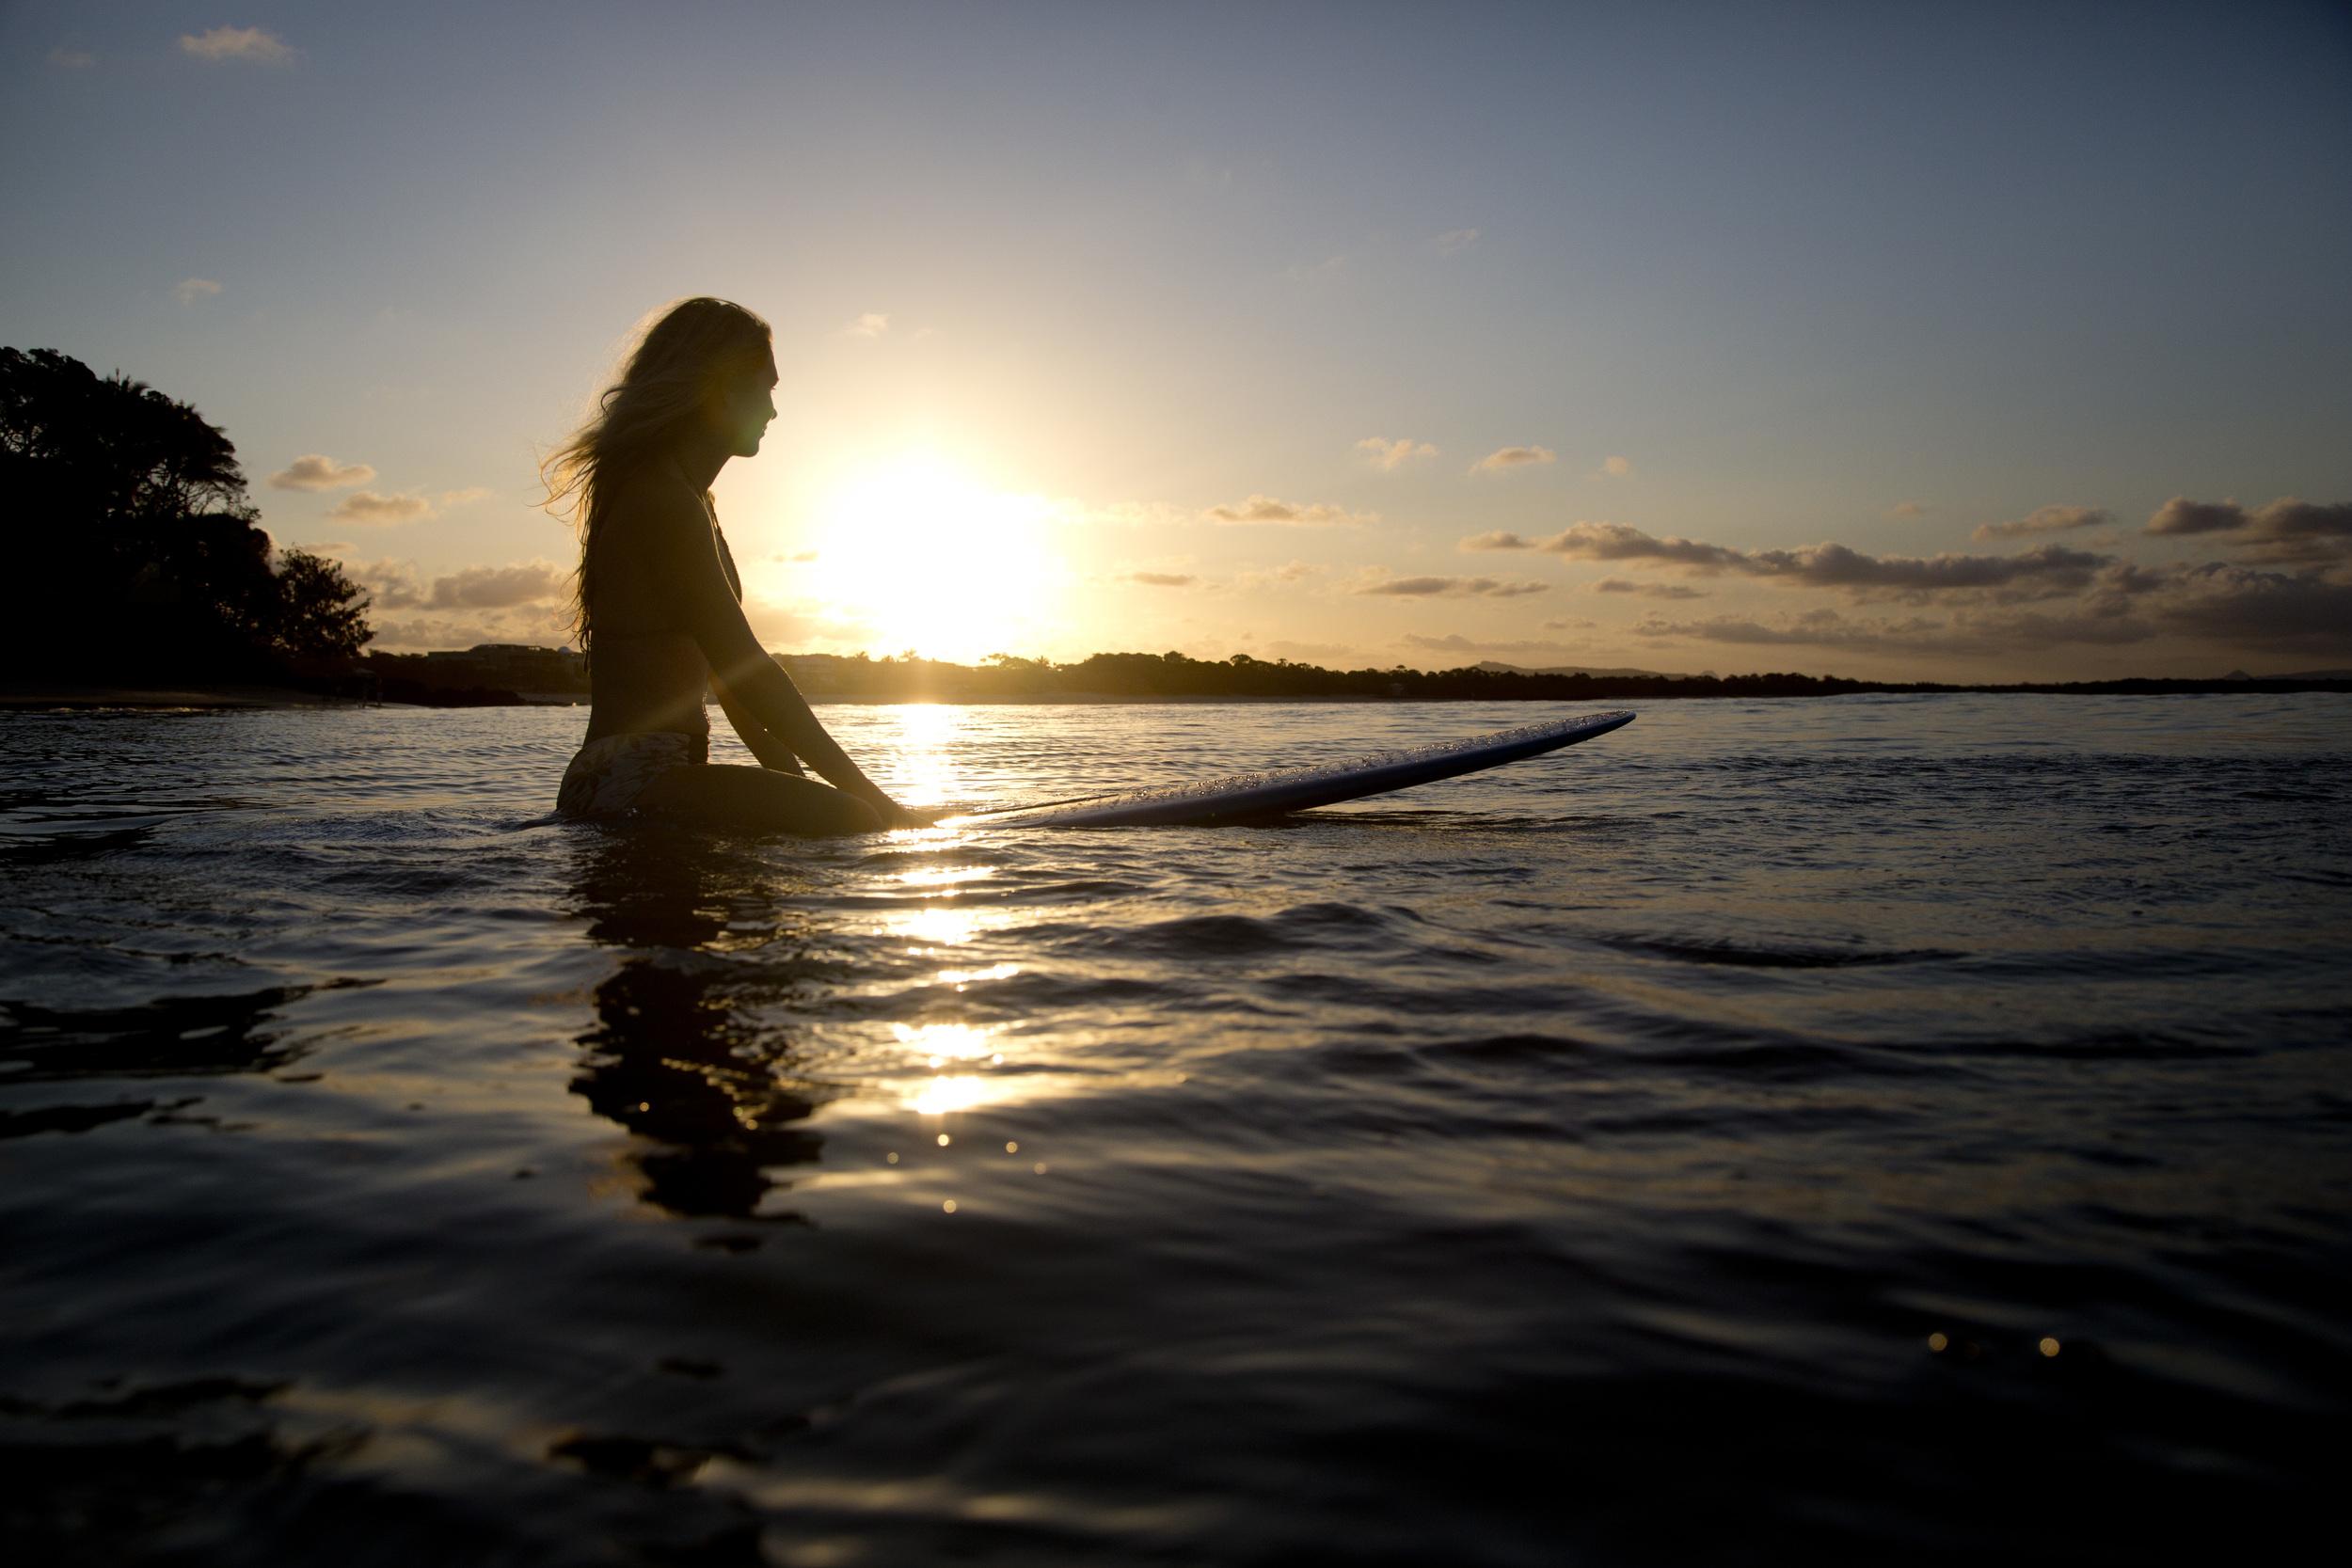 THE GIRL & THE SEA